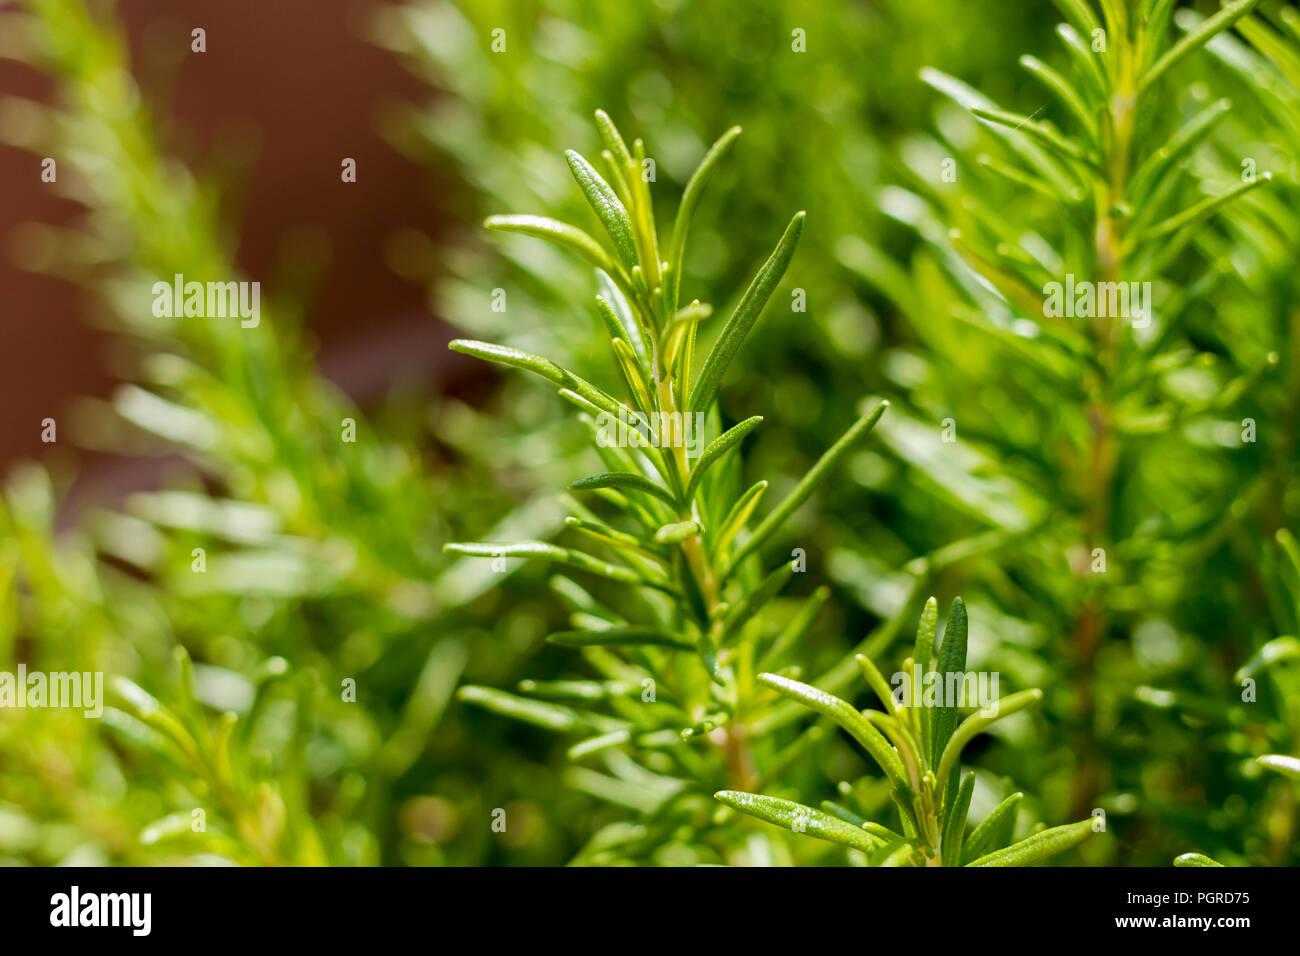 Rosmarinus Officinalis, Rosemary herb growing in summertime, Dorset, UK - Stock Image